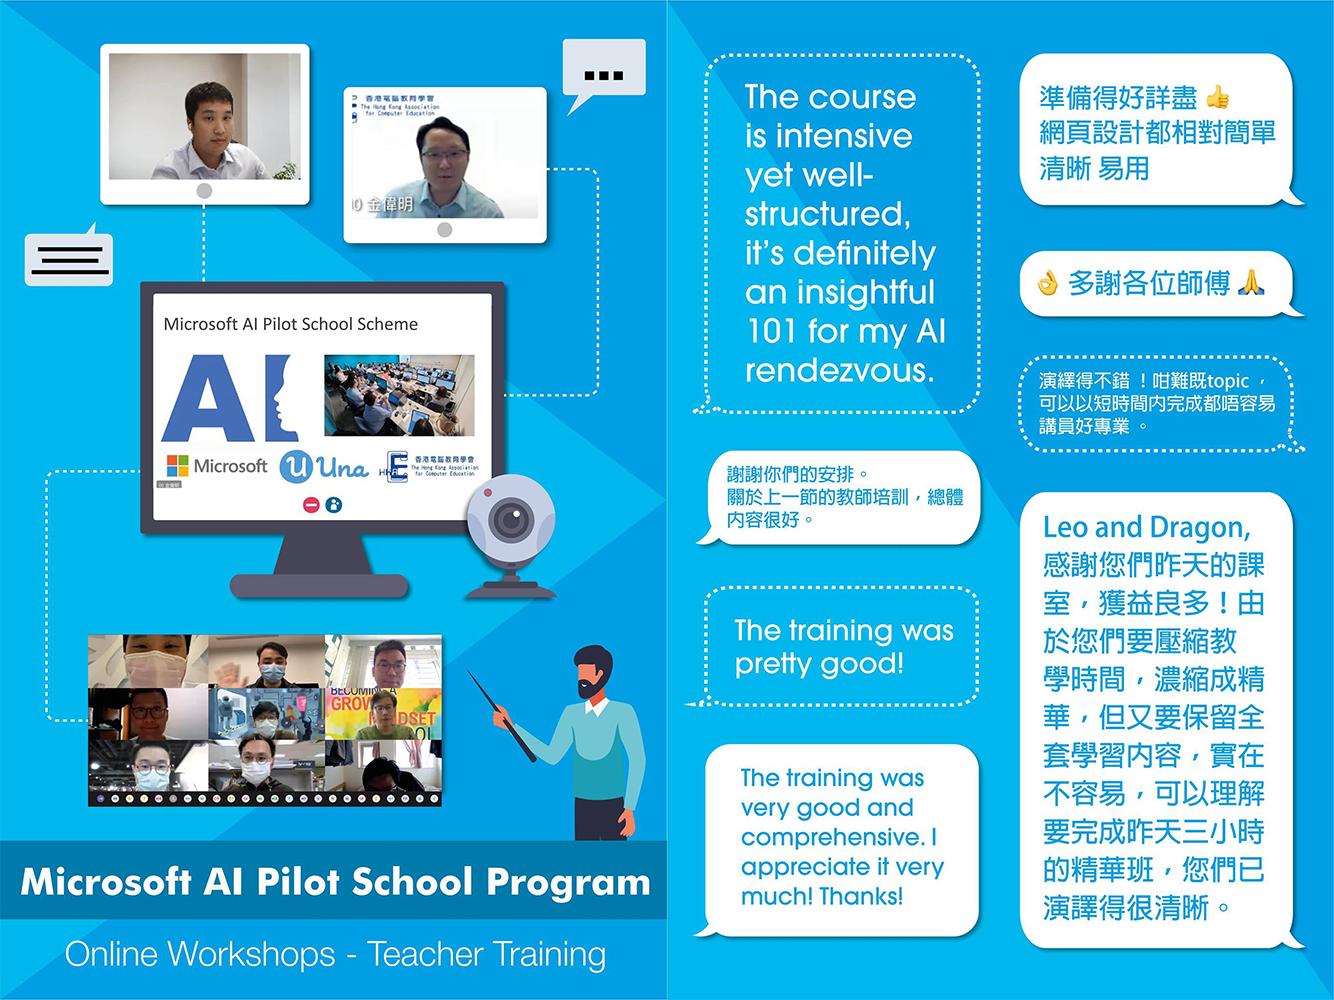 Teacher Training for Microsoft AI Pilot School Program, cooperated with Microsoft and HKACE